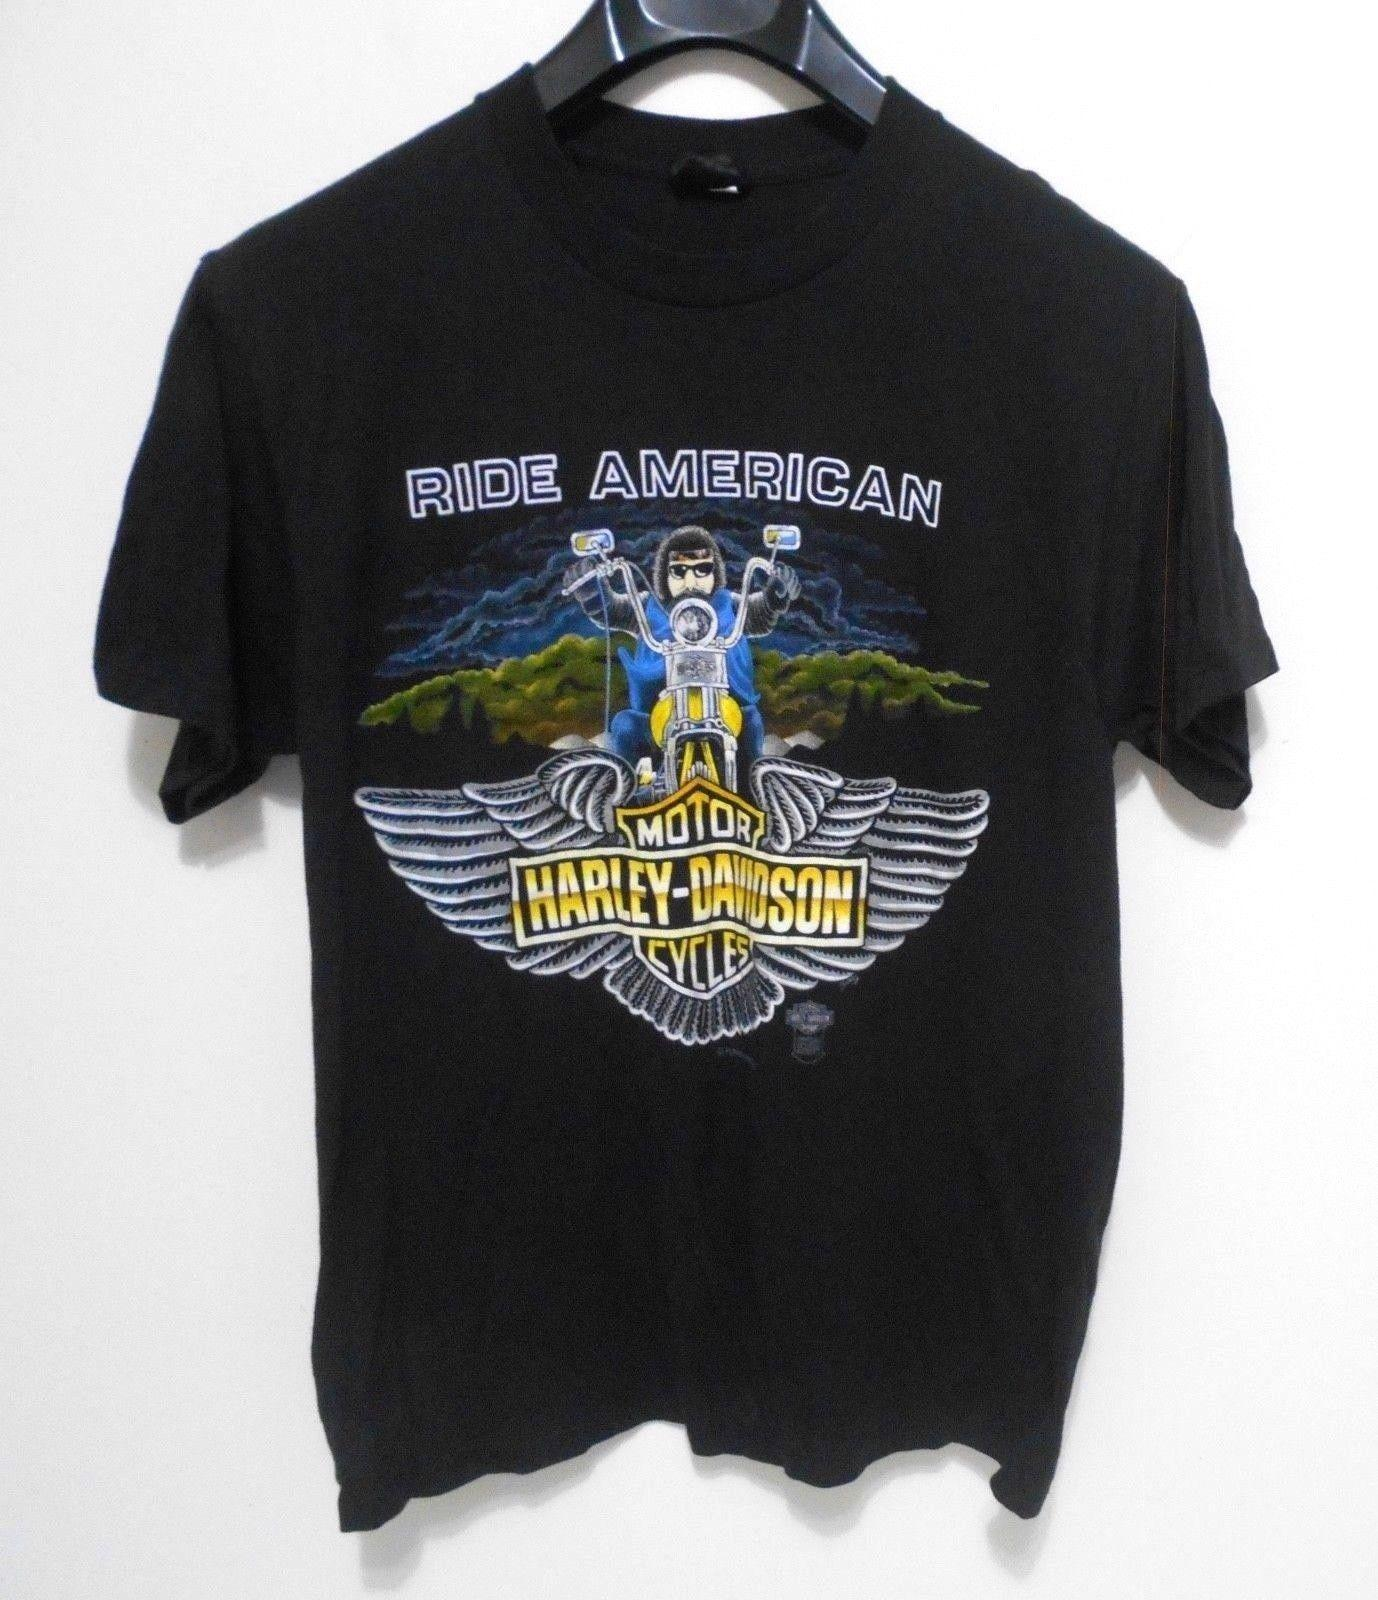 Vintage Harley Davidson Ride American T Shirt Men S Size M 1985